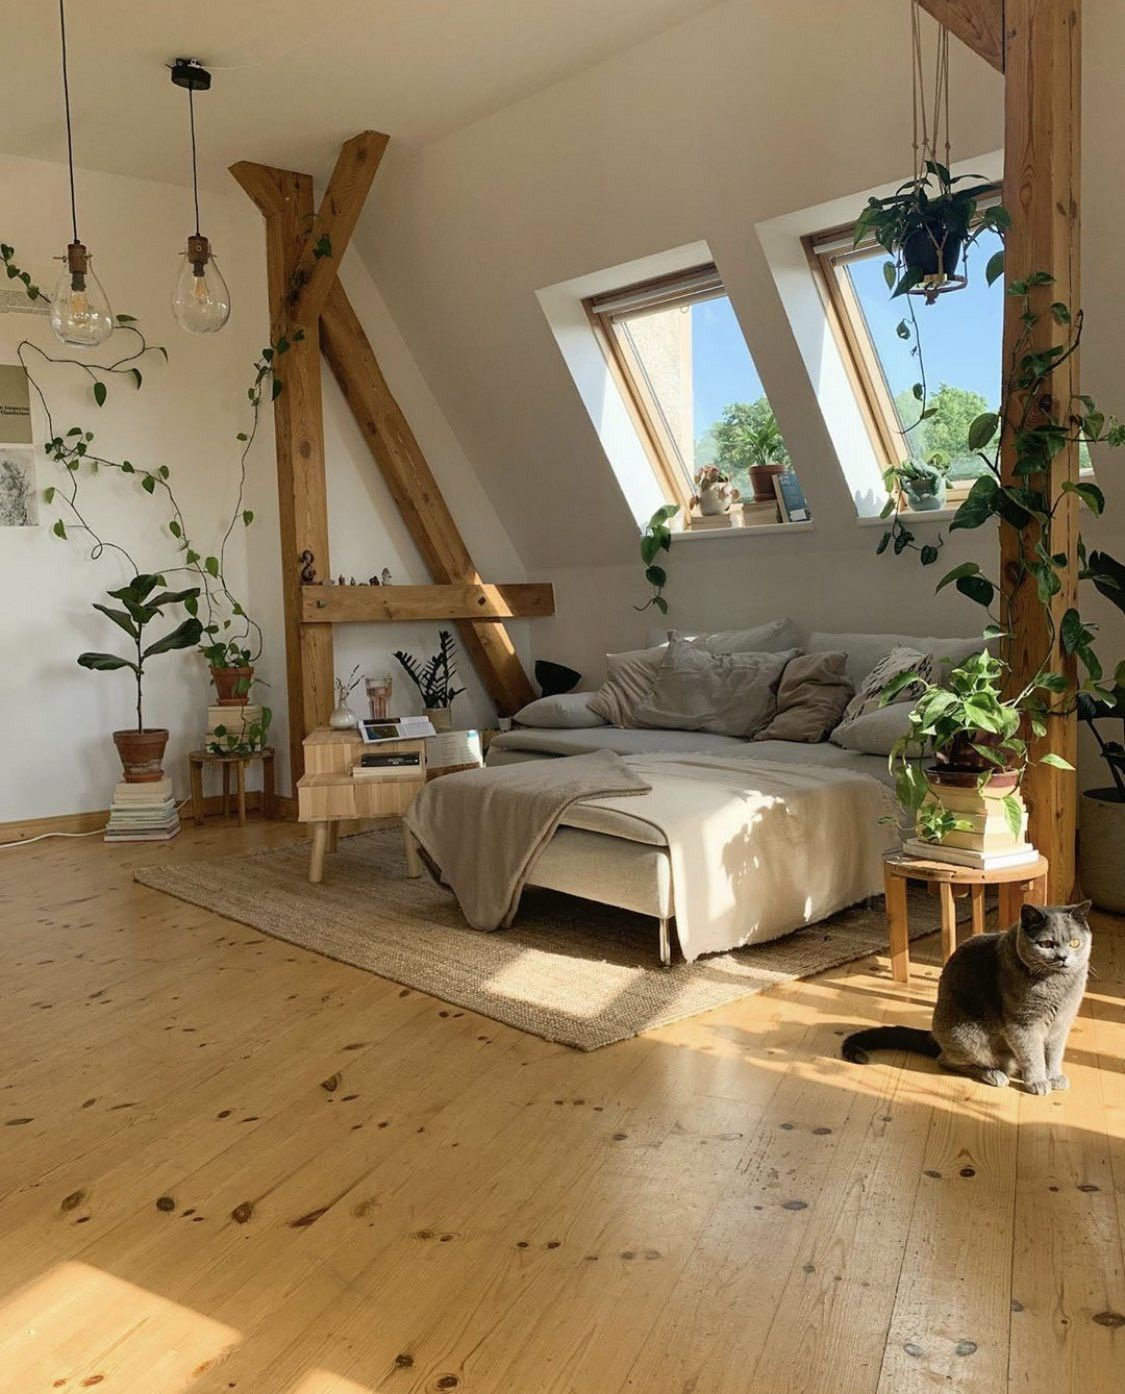 eelenagj   Room ideas bedroom, Aesthetic room decor, Dream rooms